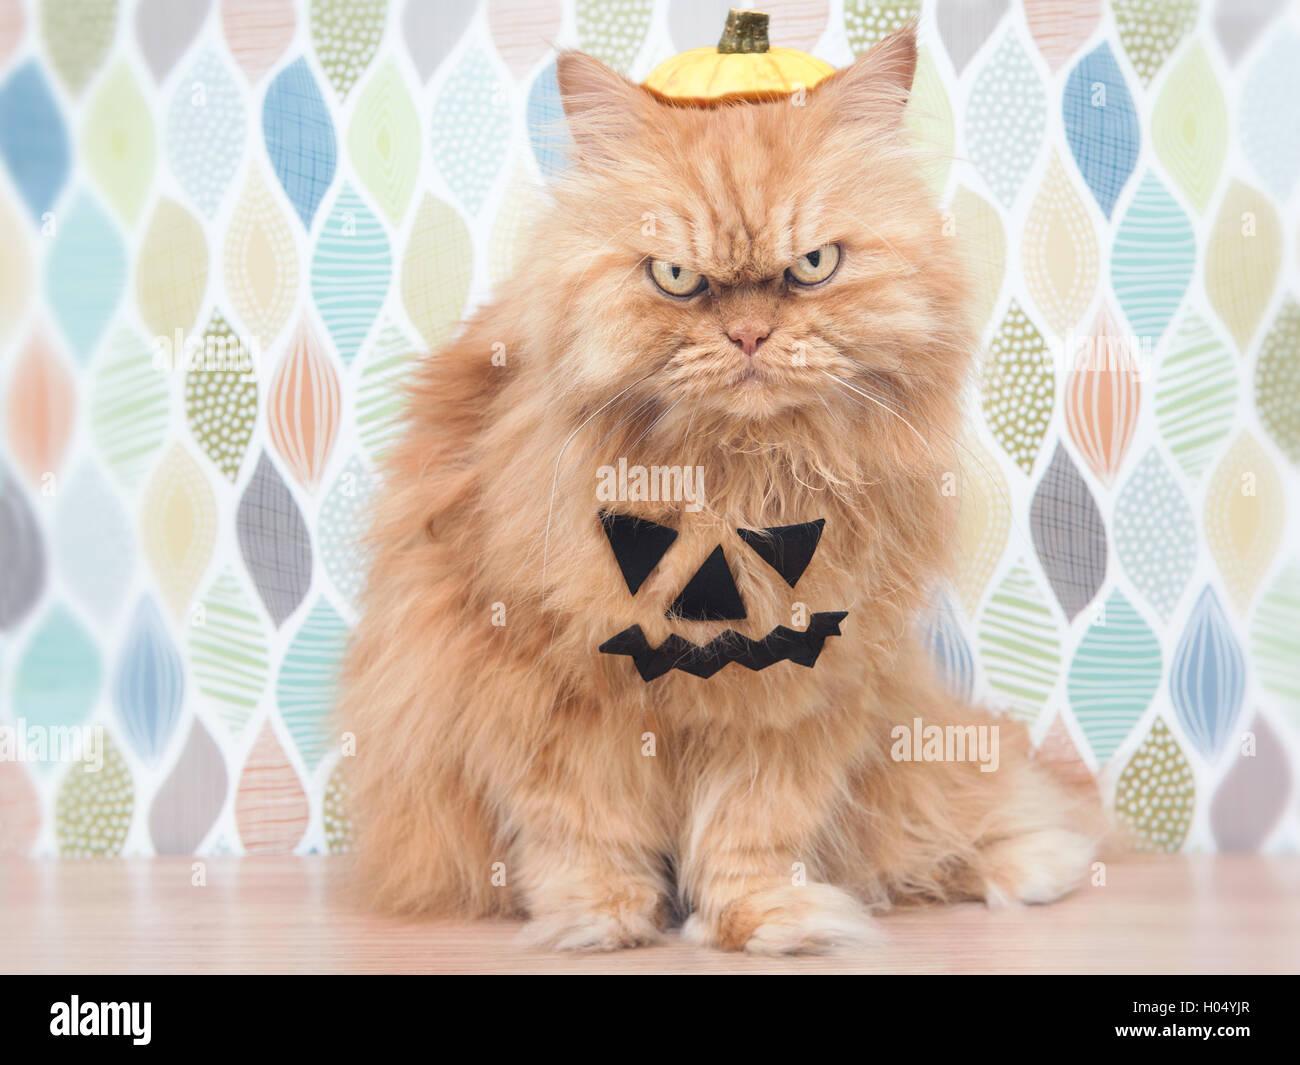 Halloween Cat - Stock Image